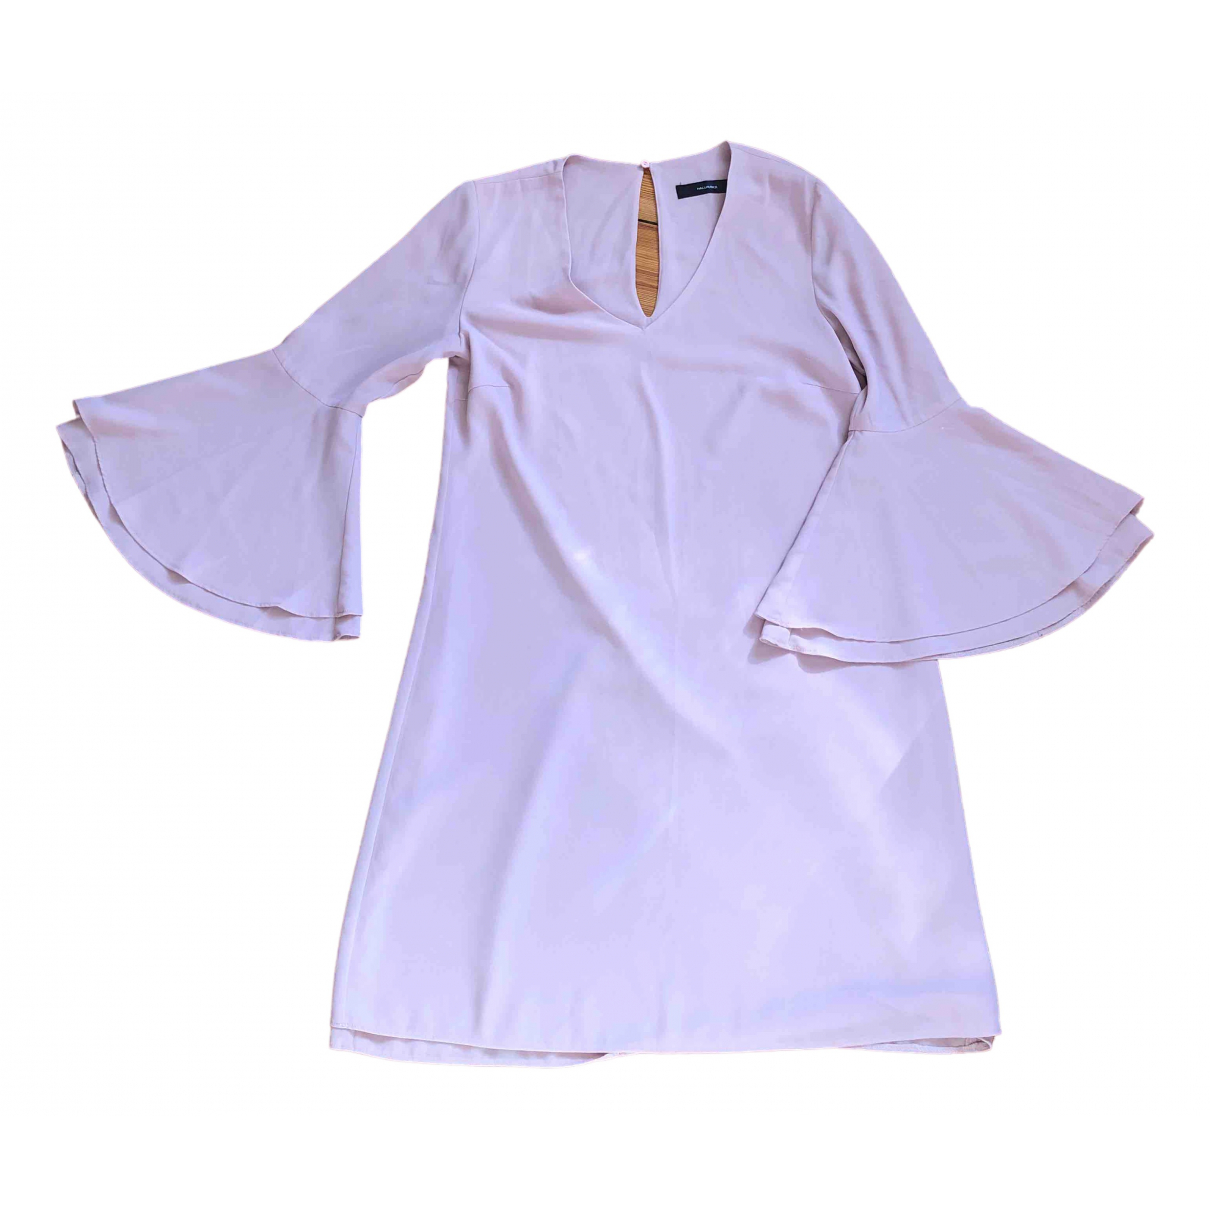 Hallhuber \N Kleid in  Rosa Polyester